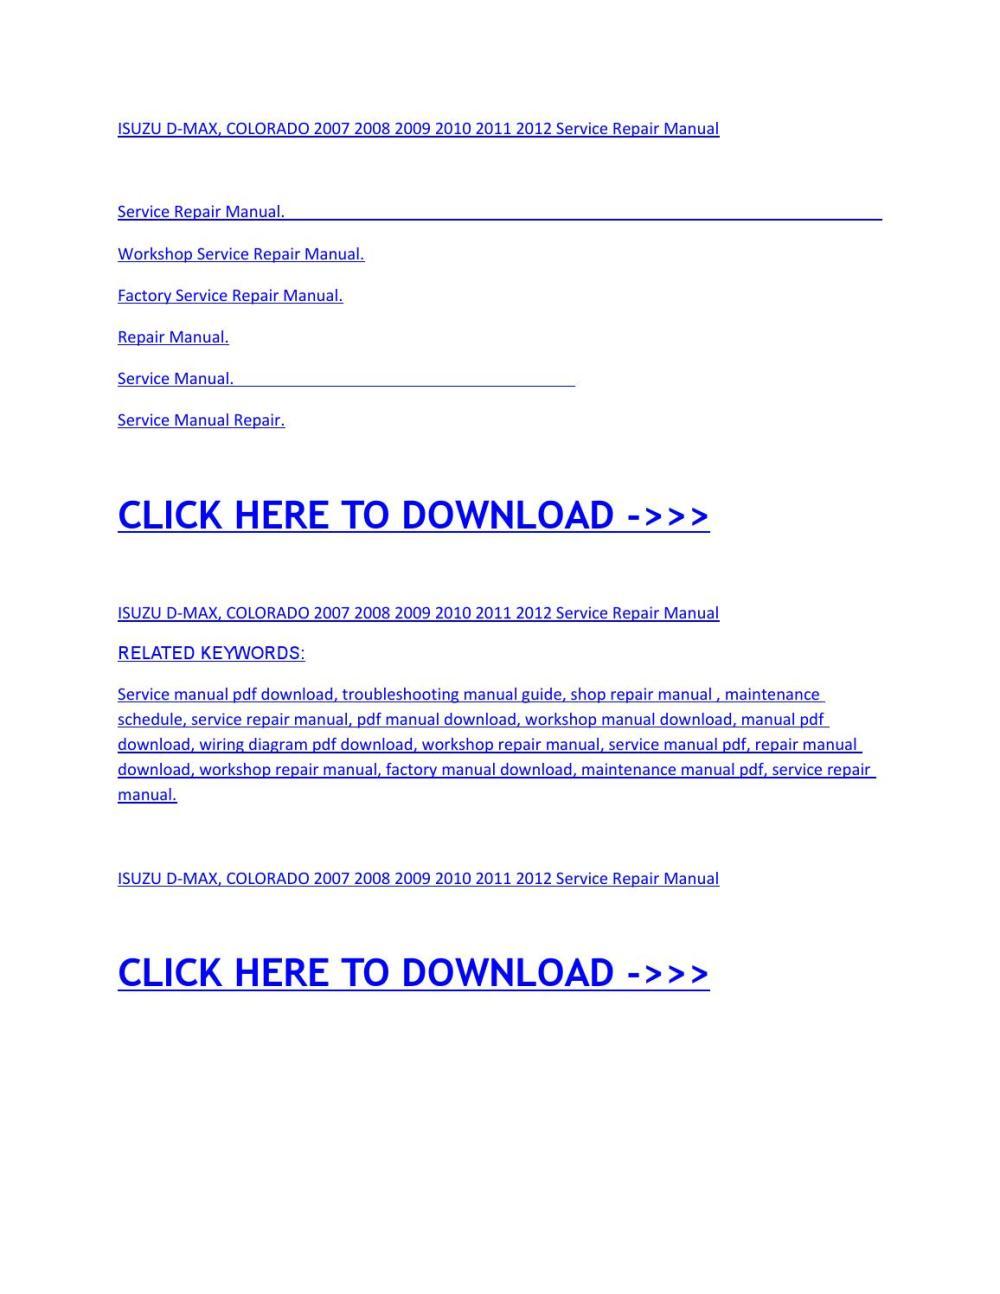 medium resolution of isuzu d max colorado 2007 2008 2009 2010 2011 2012 service repair manual by miha issuu